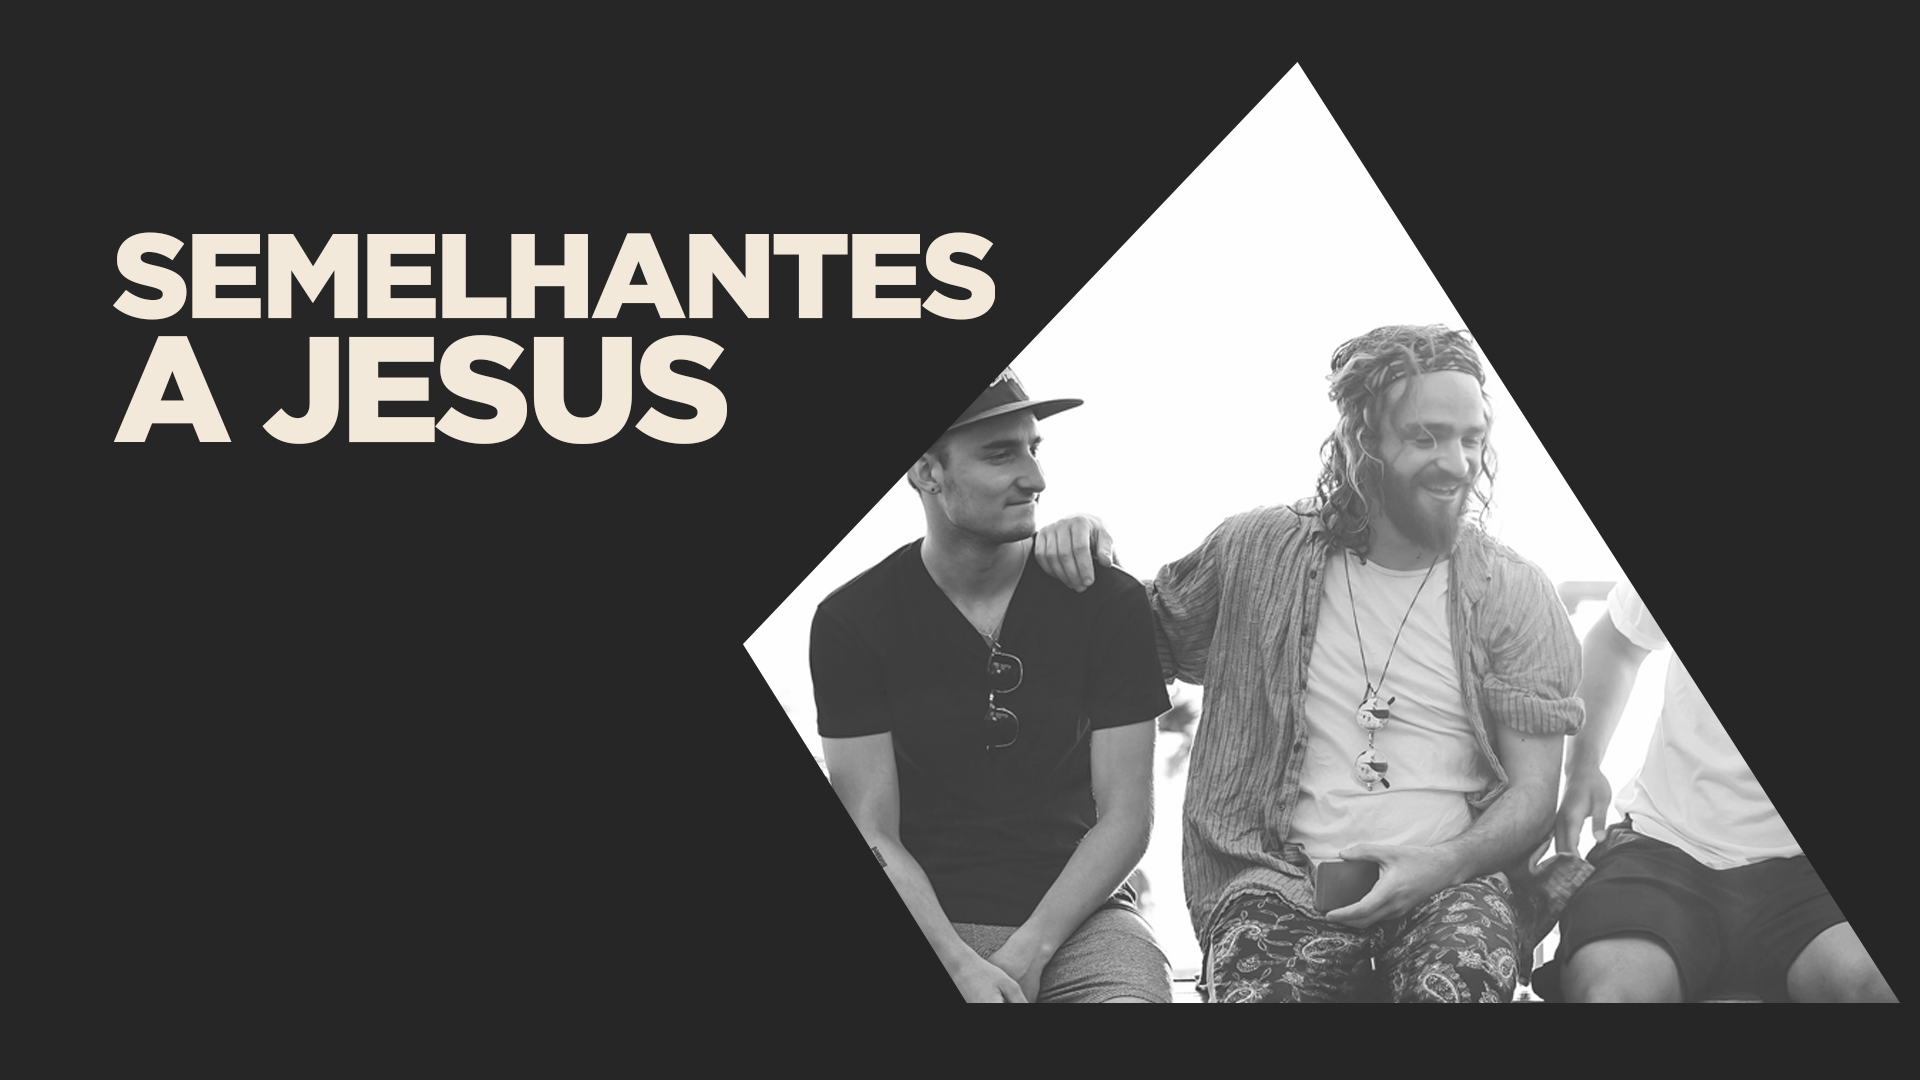 Semelhantes_a_Jesus.png